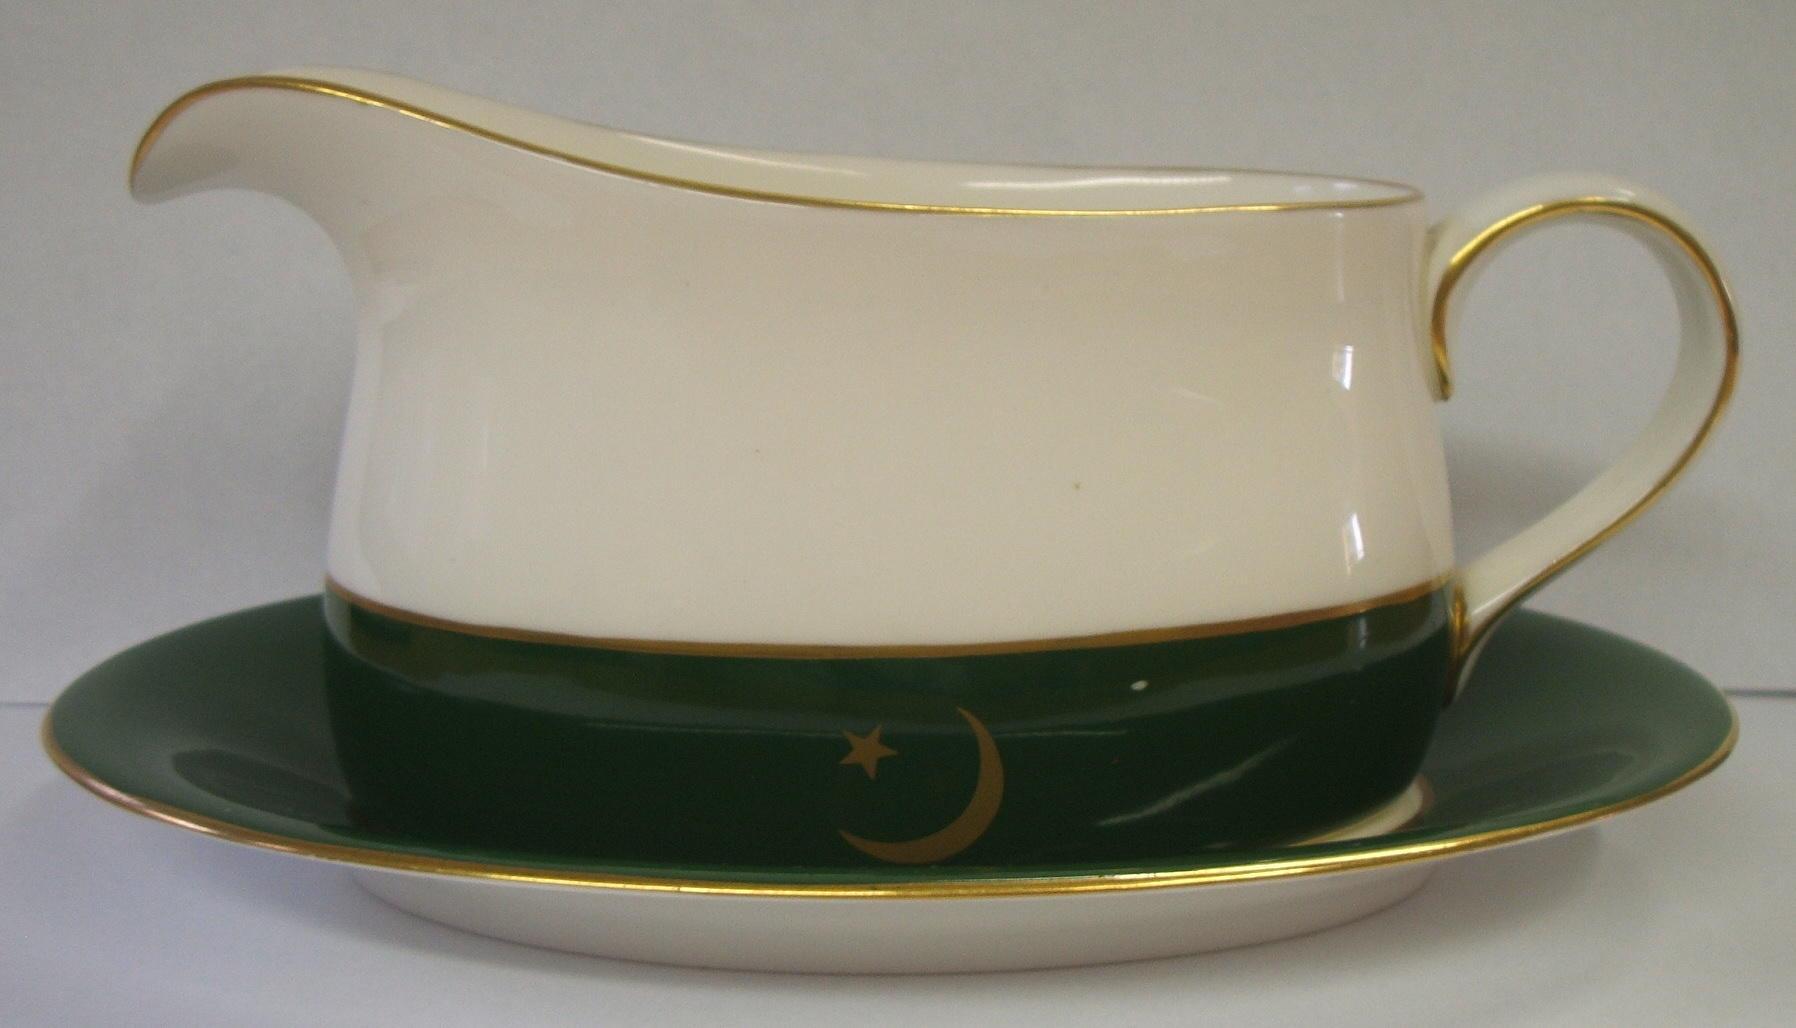 royal-crown-derby-pakistan-embassy-ware-gravy-boat